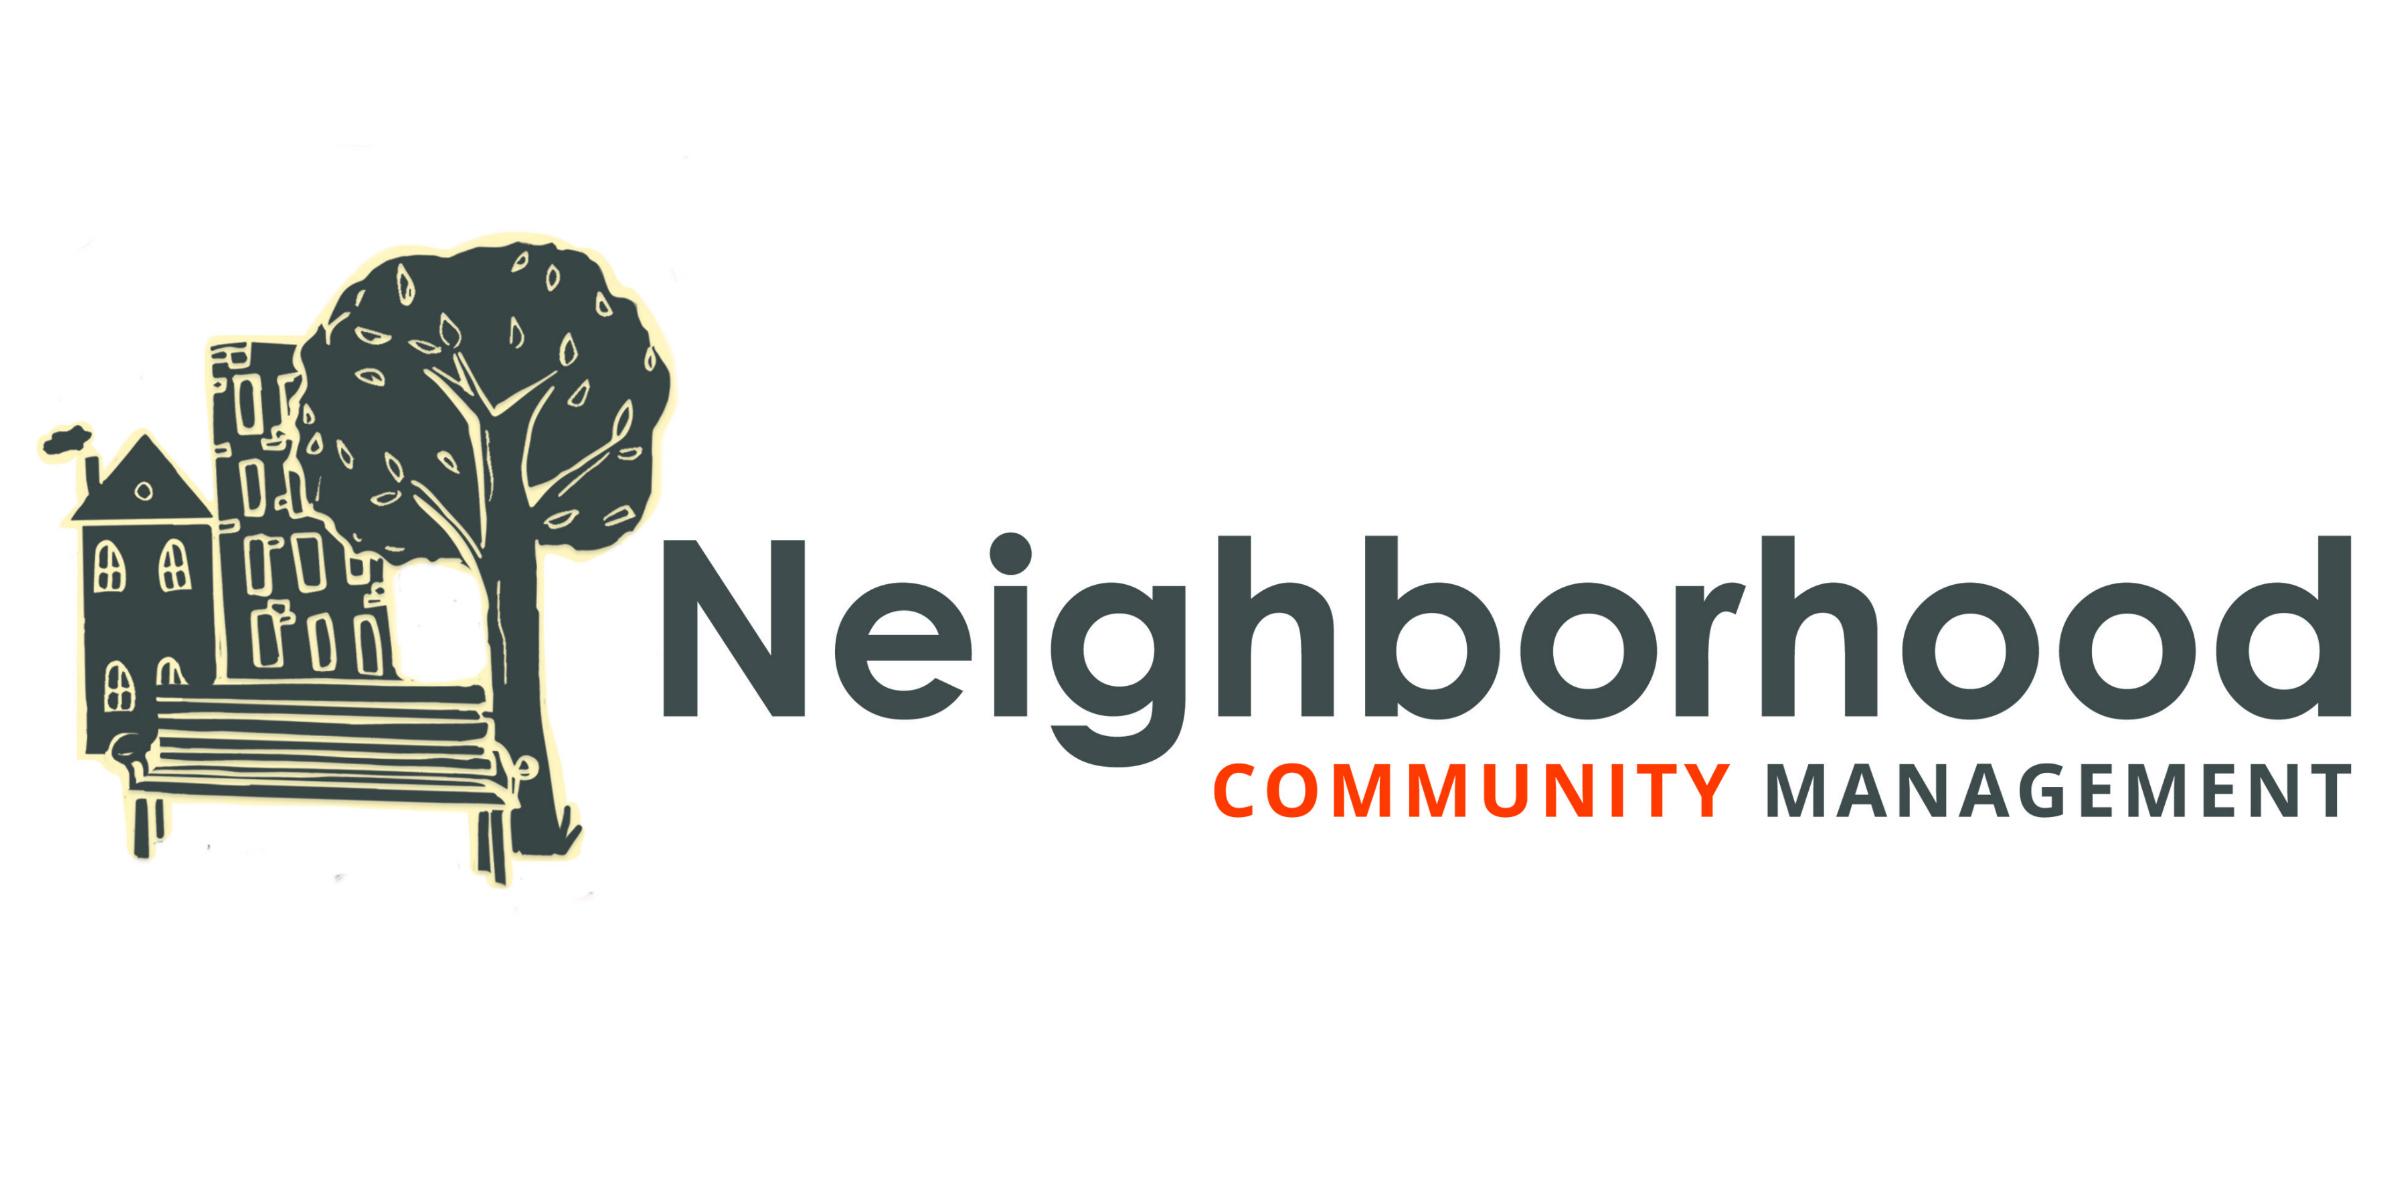 neighborhoodcommunitymanagement.jpg